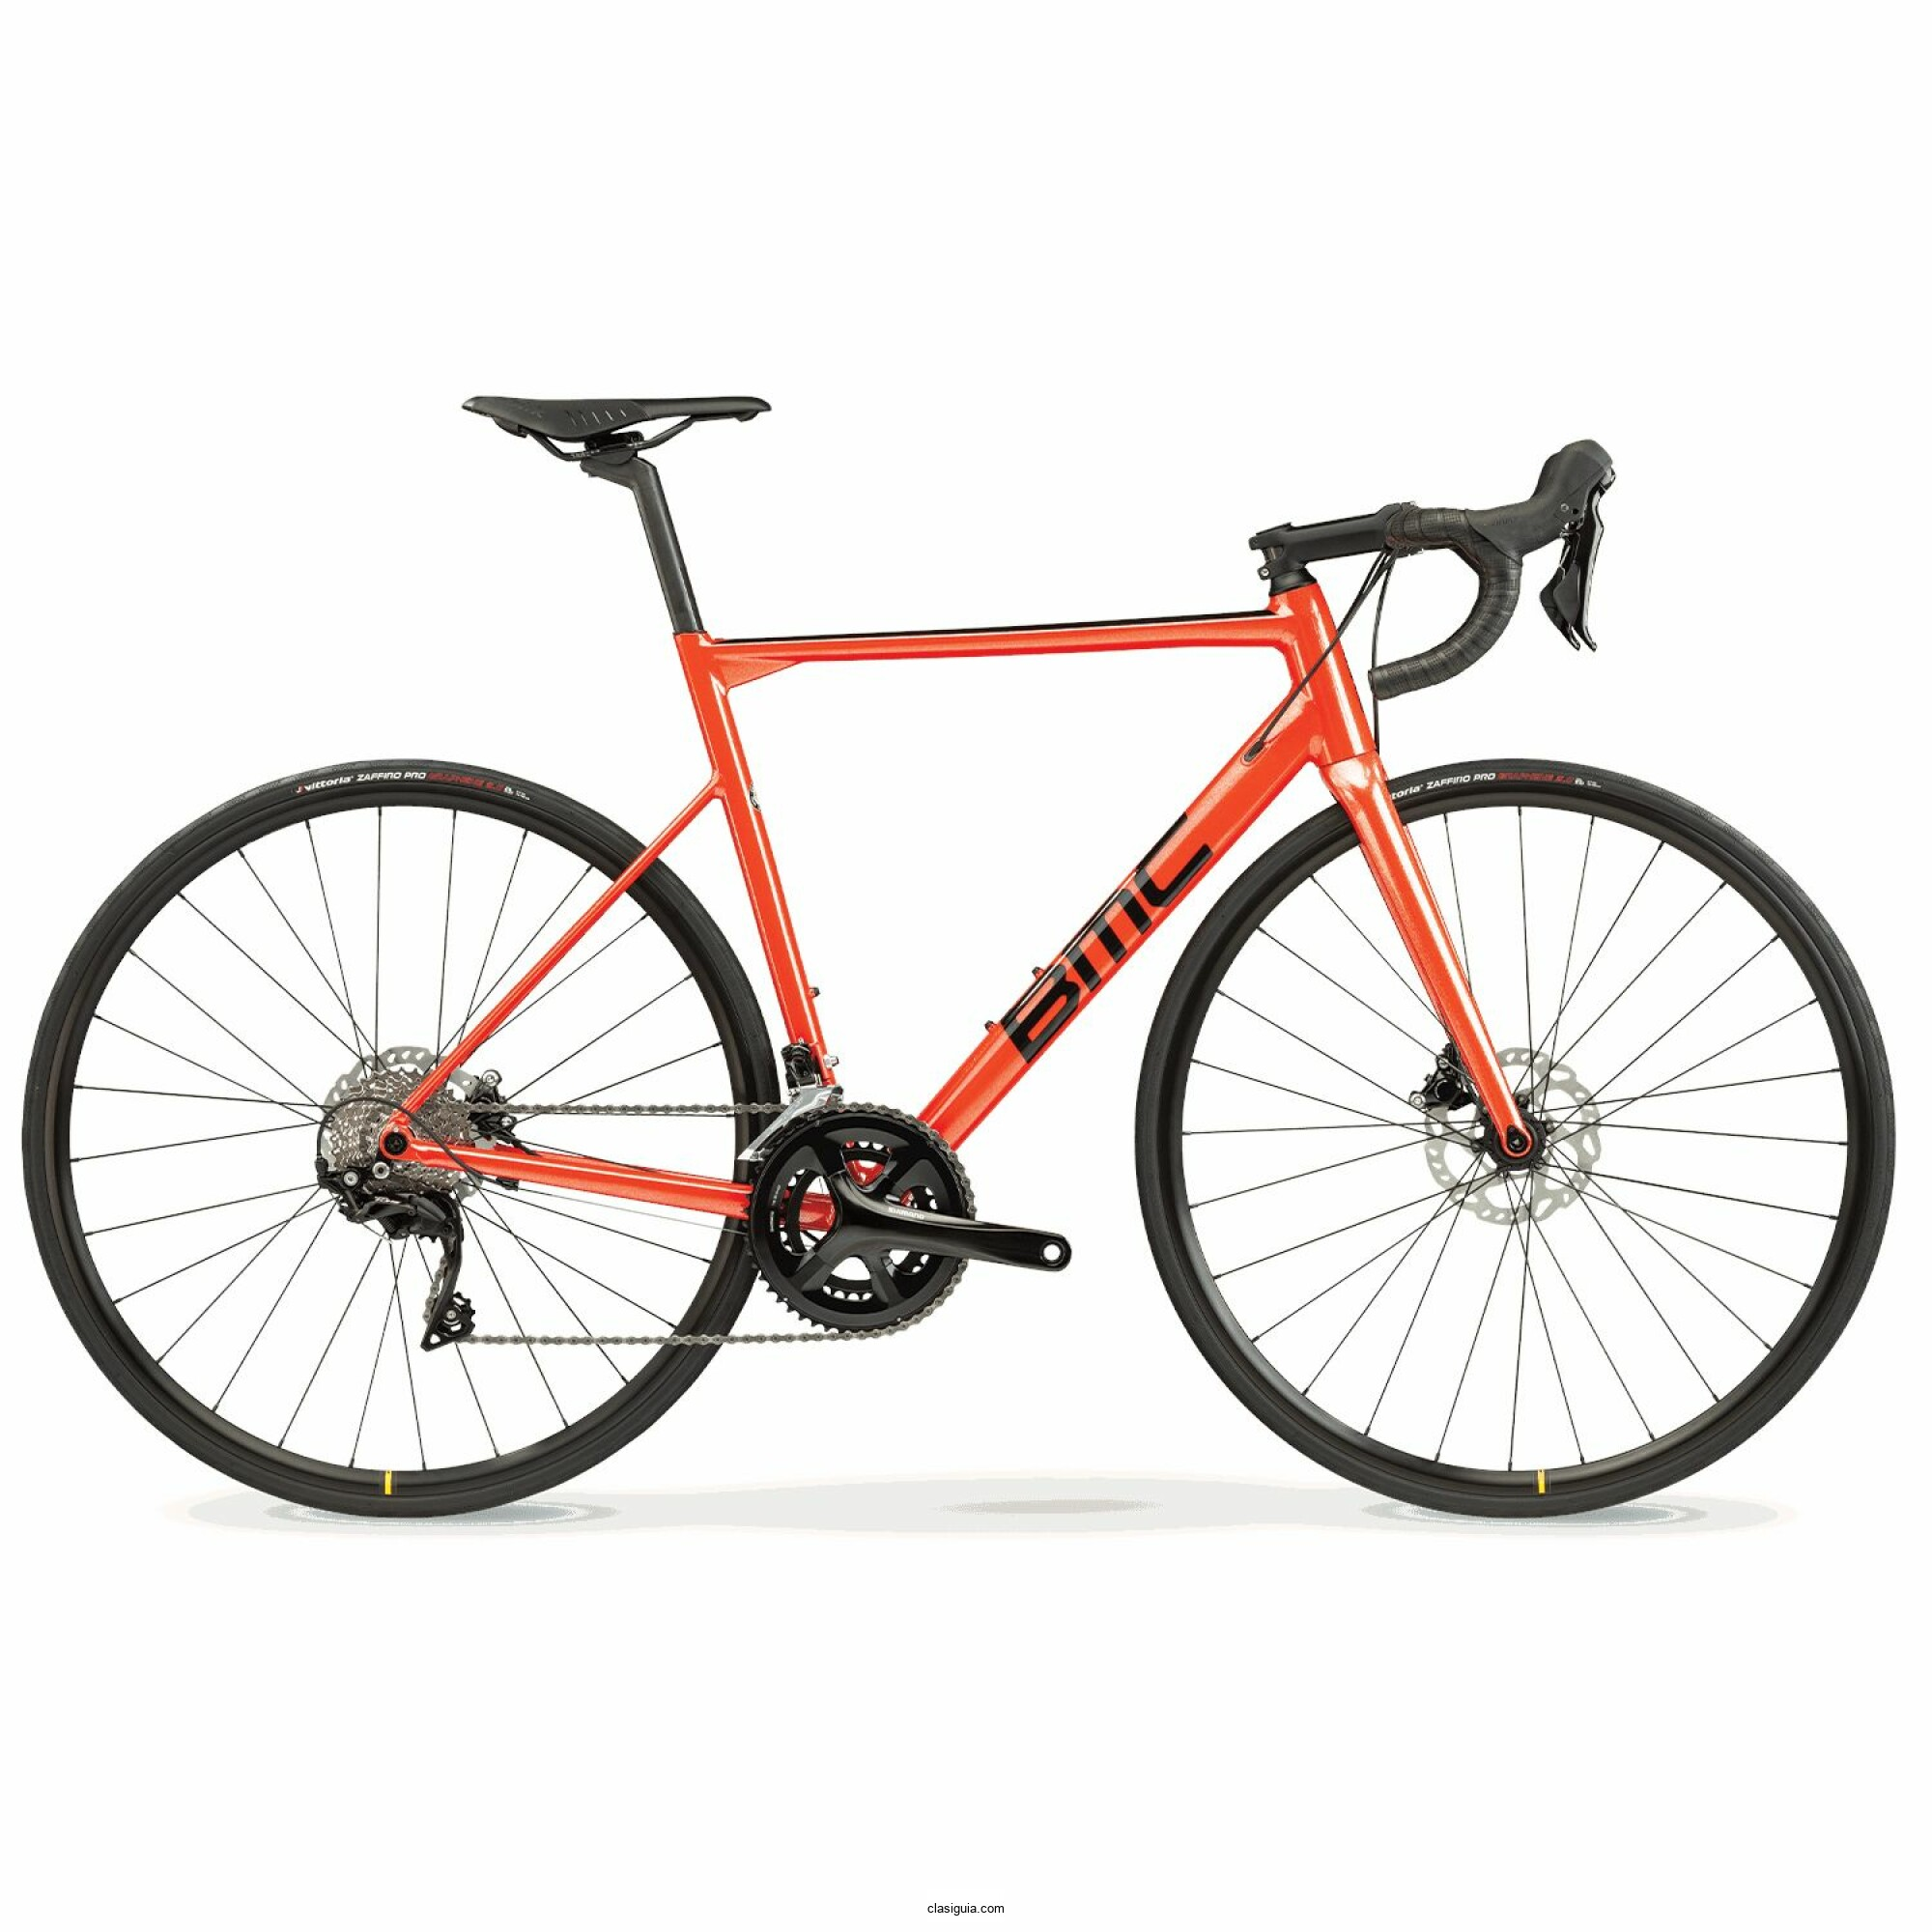 2021 - BMC Road Bike Teammachine ALR DISC TWO - 105 (RUNCYCLES)